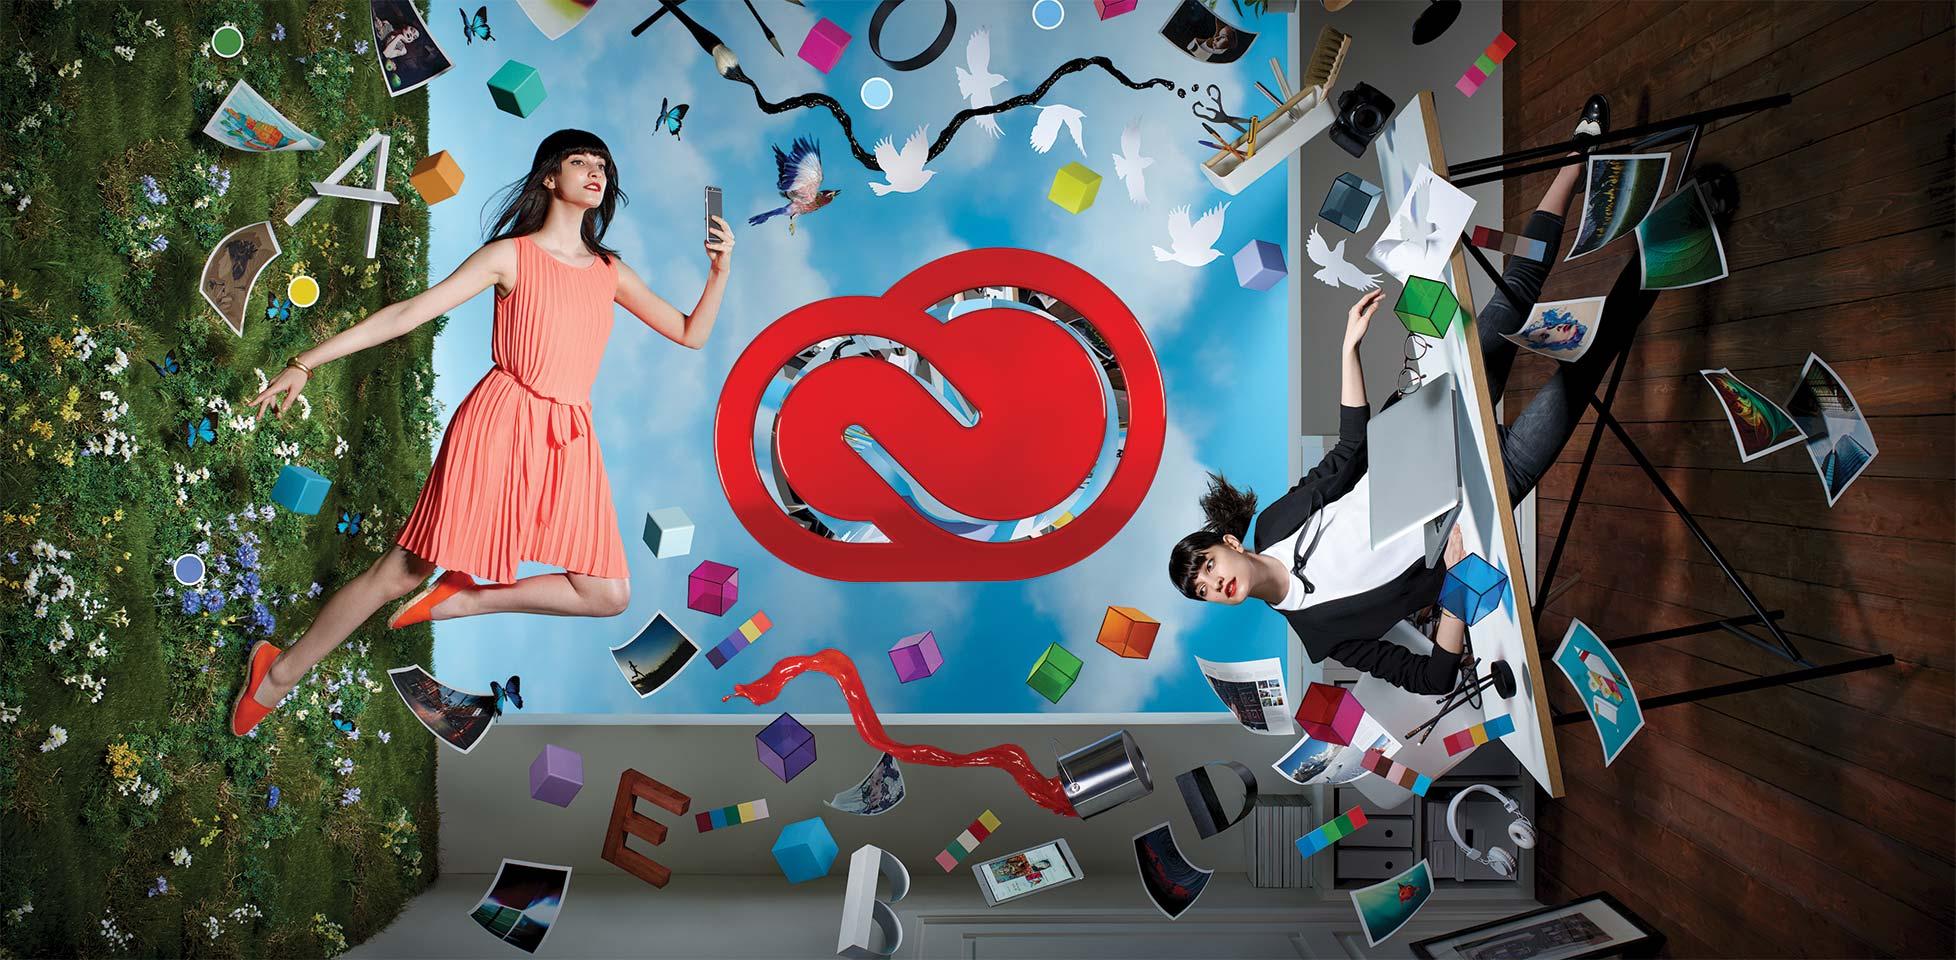 Adobe releases major Creative Cloud update